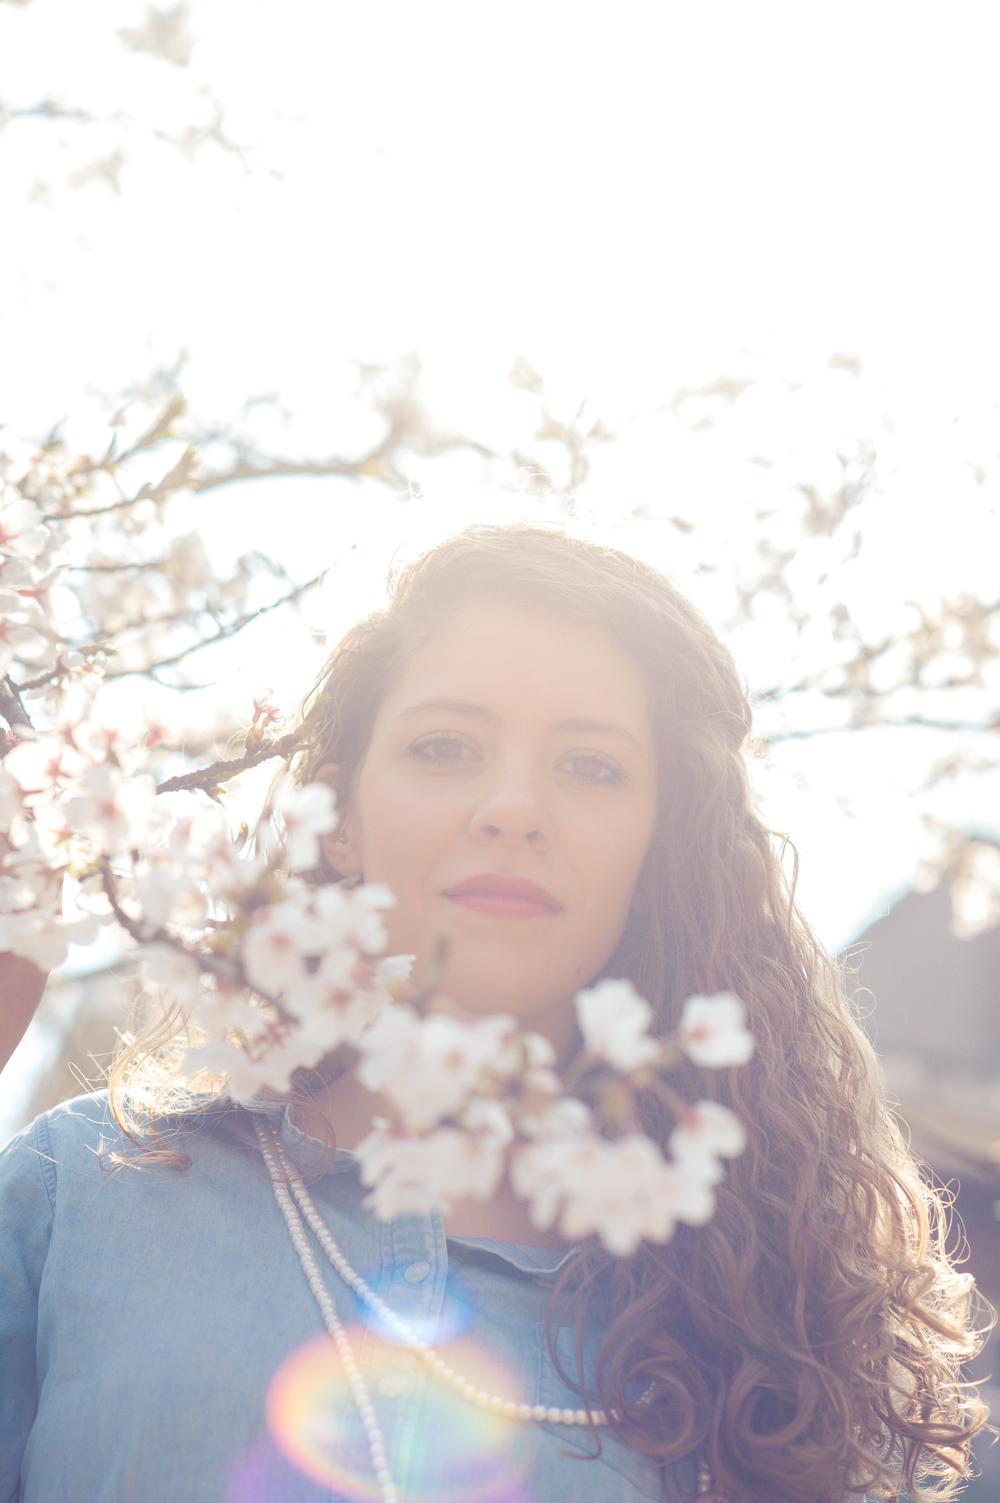 CherryBlossomStyledShootKoreaAlyshaCGSPhotography (21 of 57).jpg